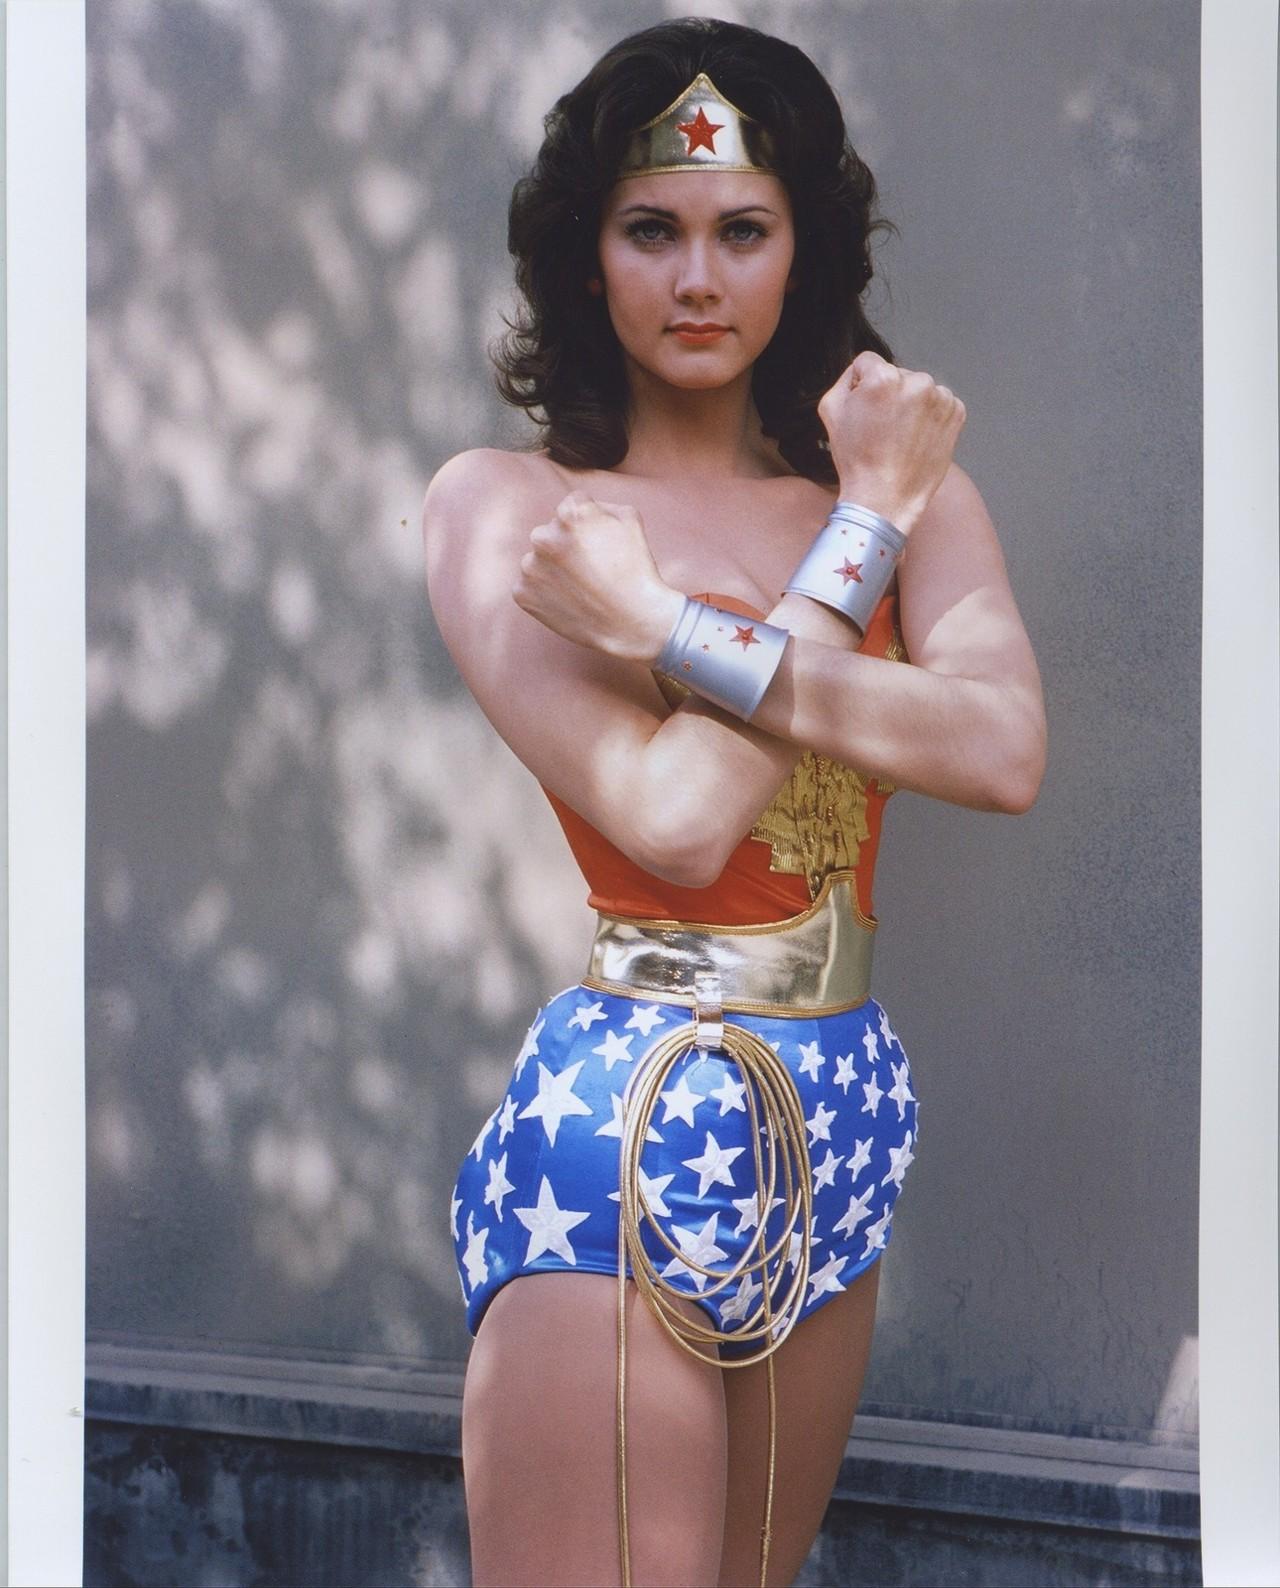 wonder woman - photo #33